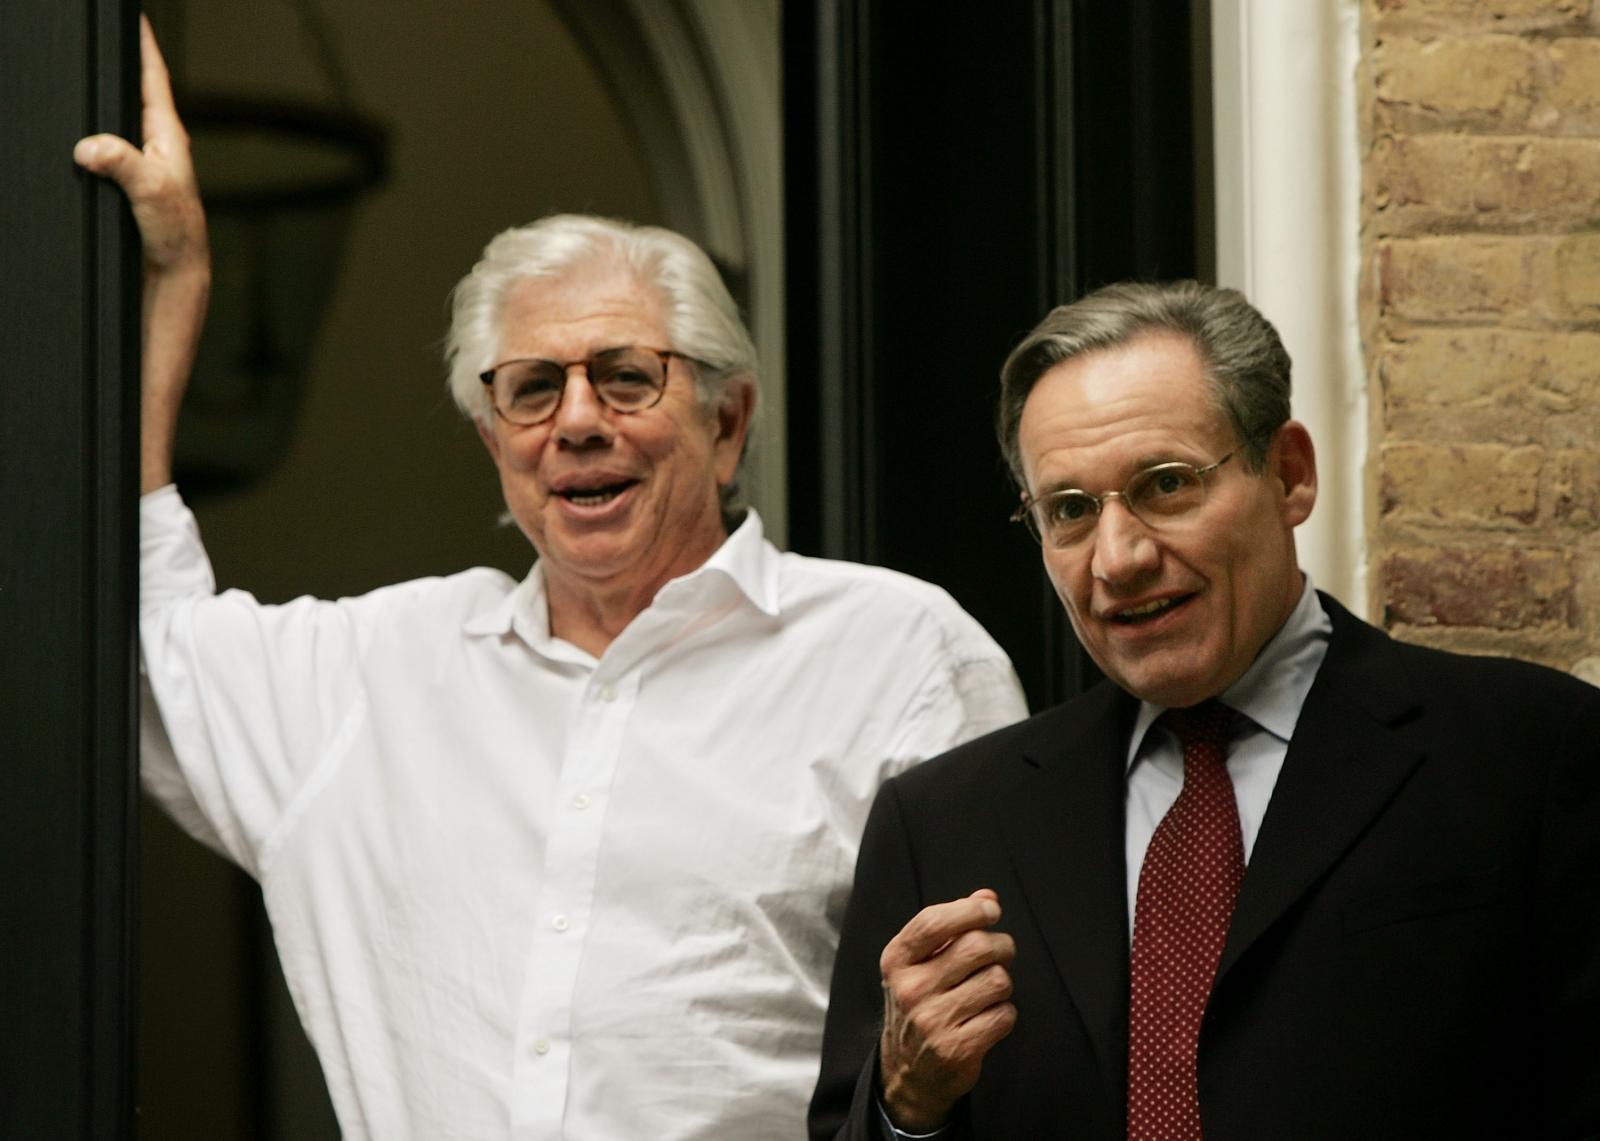 Watergate Bob Woodward and Carl Bernstein